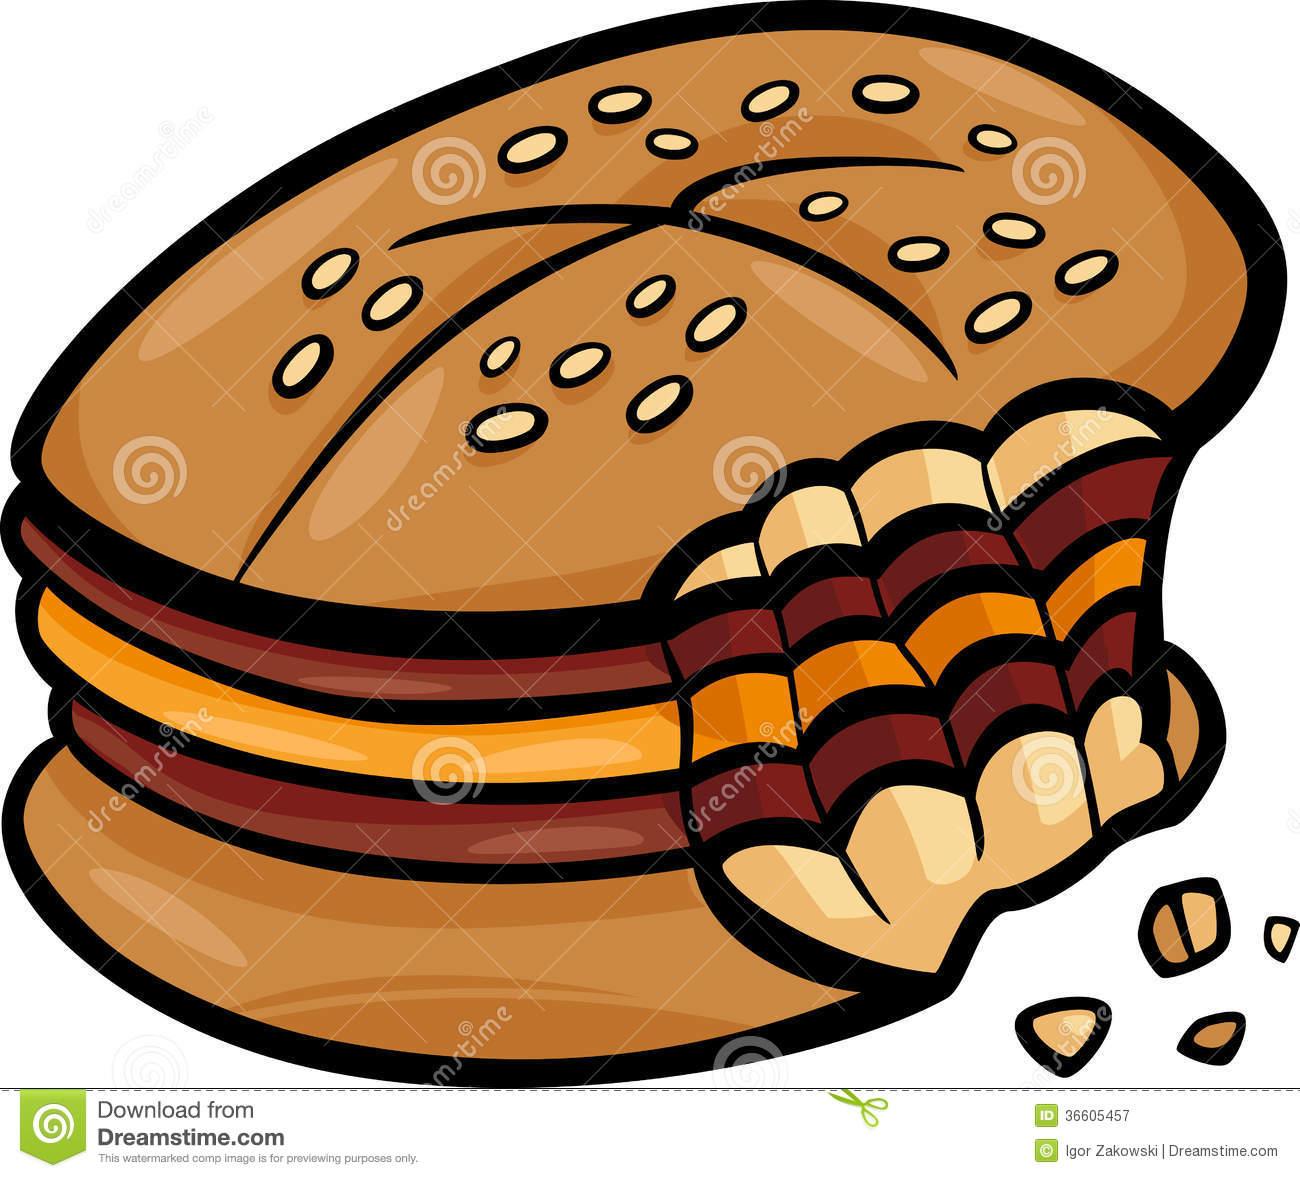 Bitten Cheeseburger Cartoon Clip Art Royalty Free Stock.